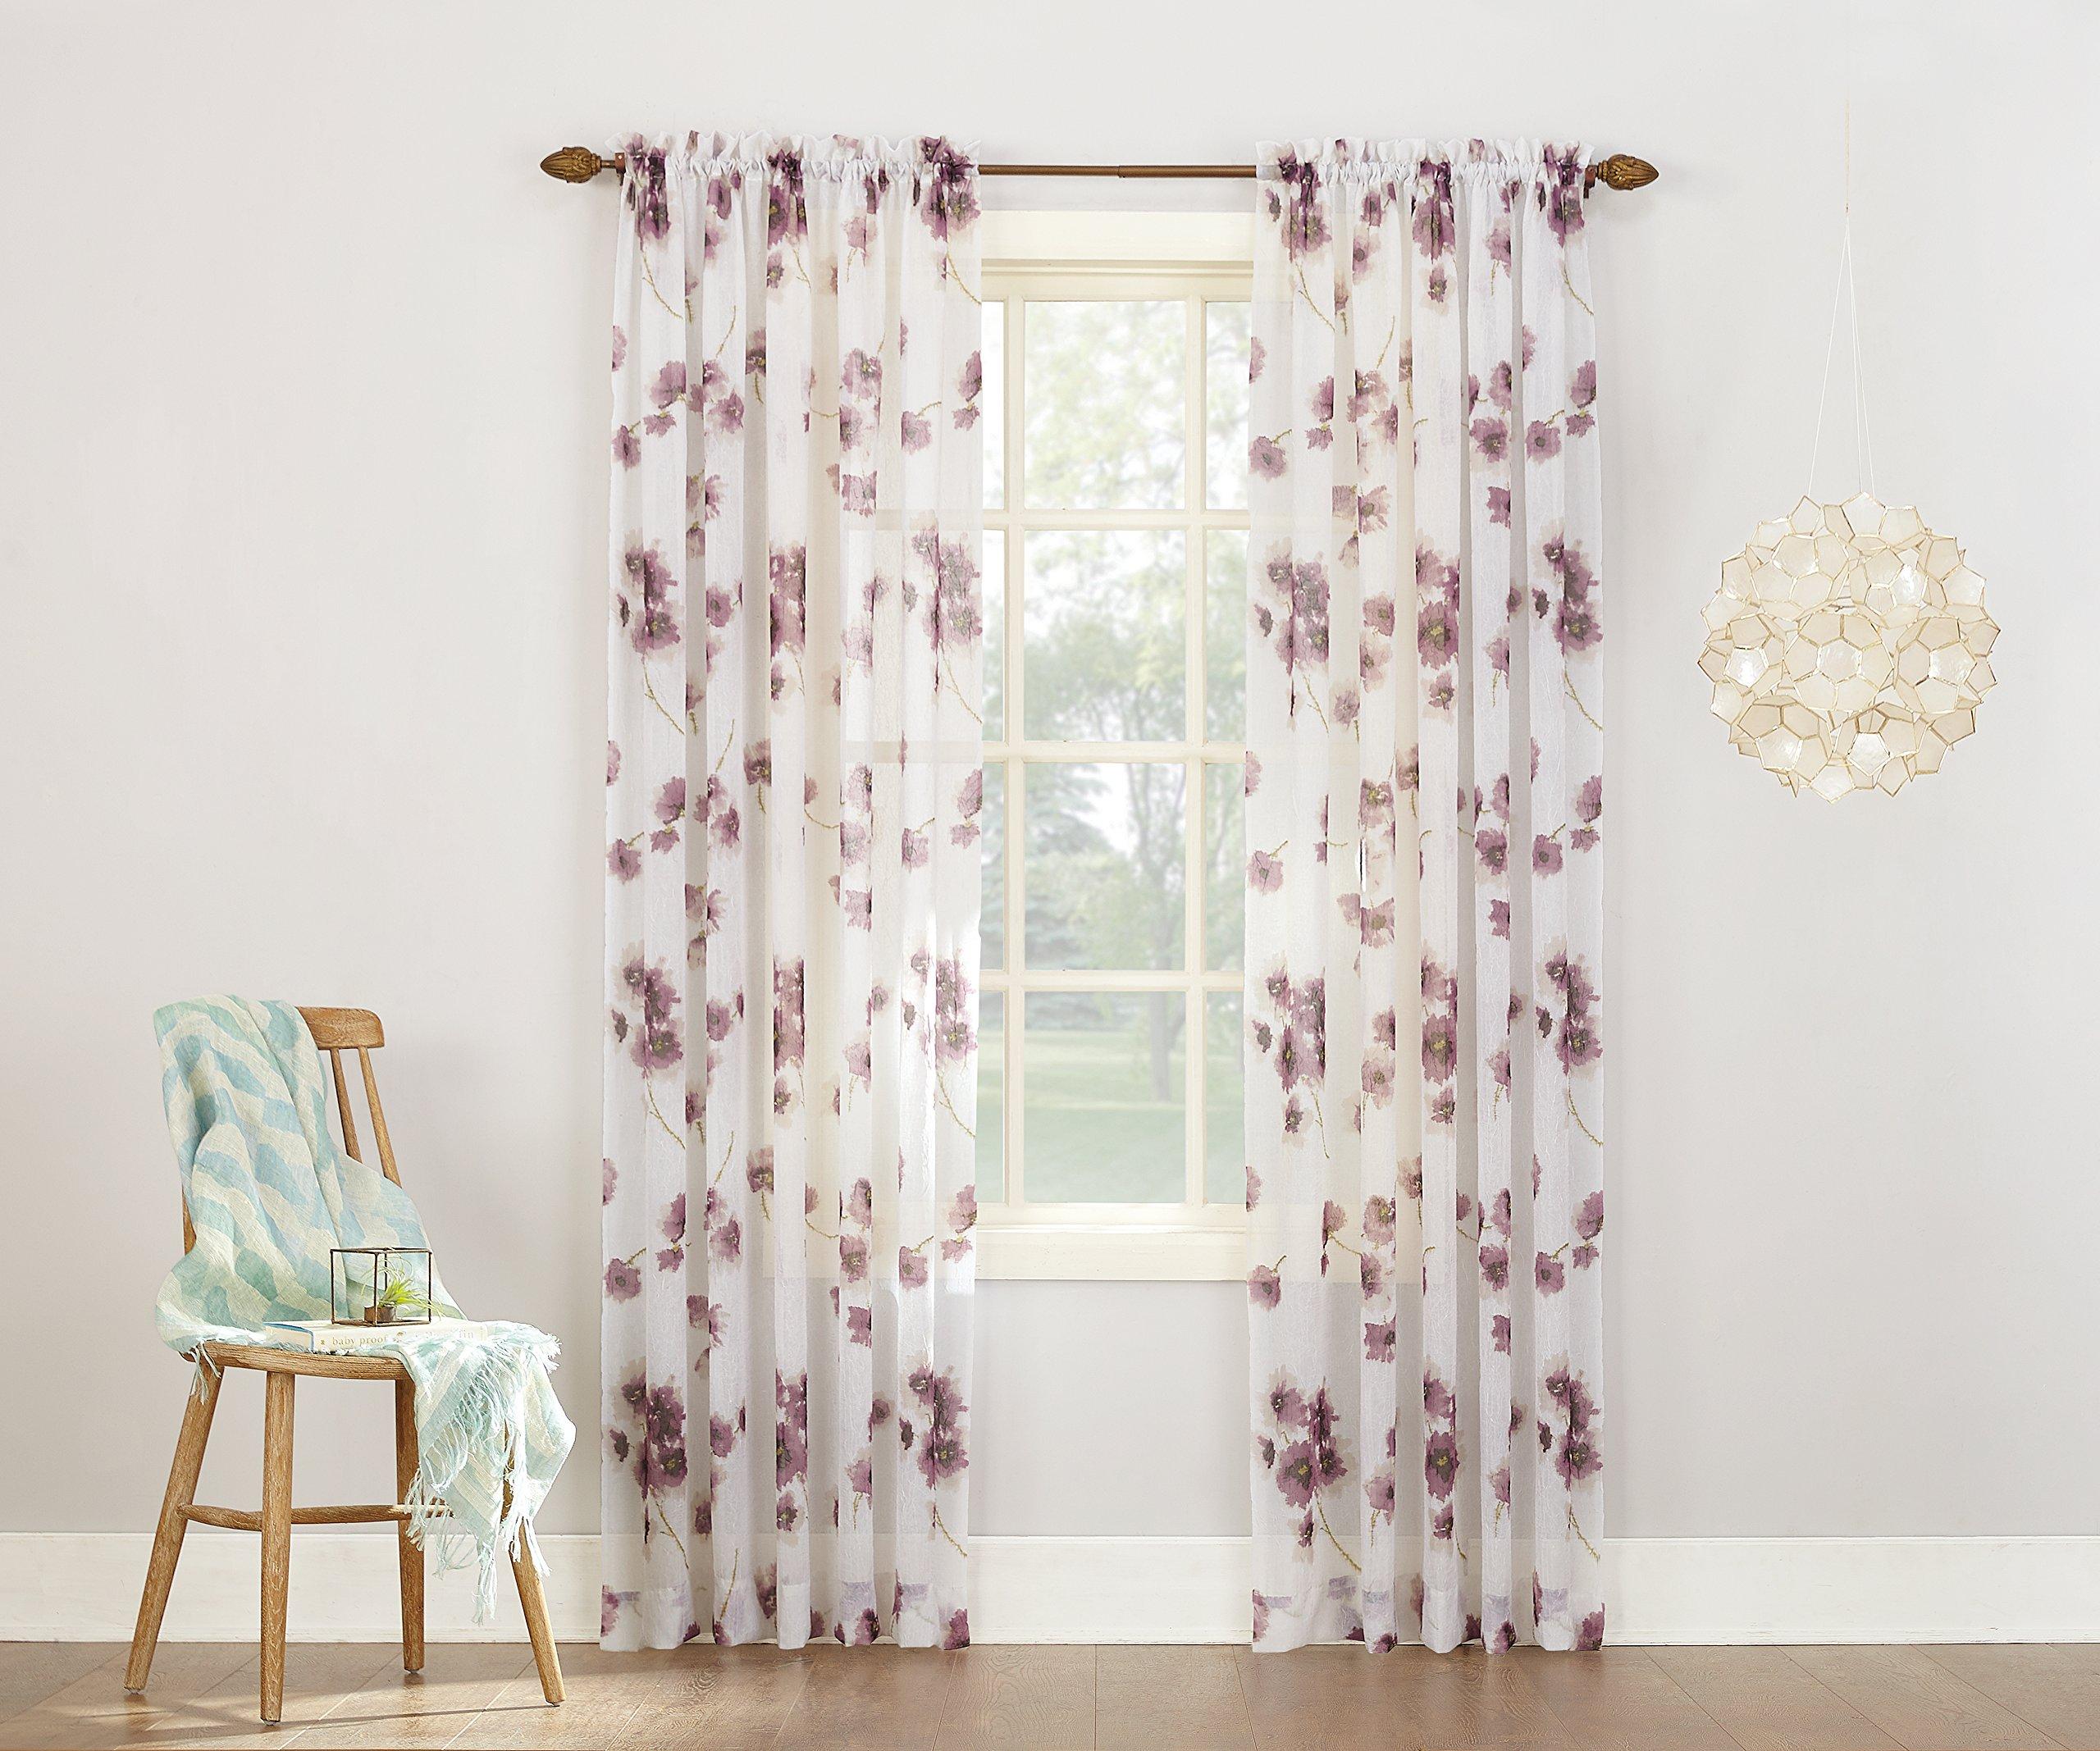 bordeaux gradient set panel curtain voile sheer ferrari white silk curtains